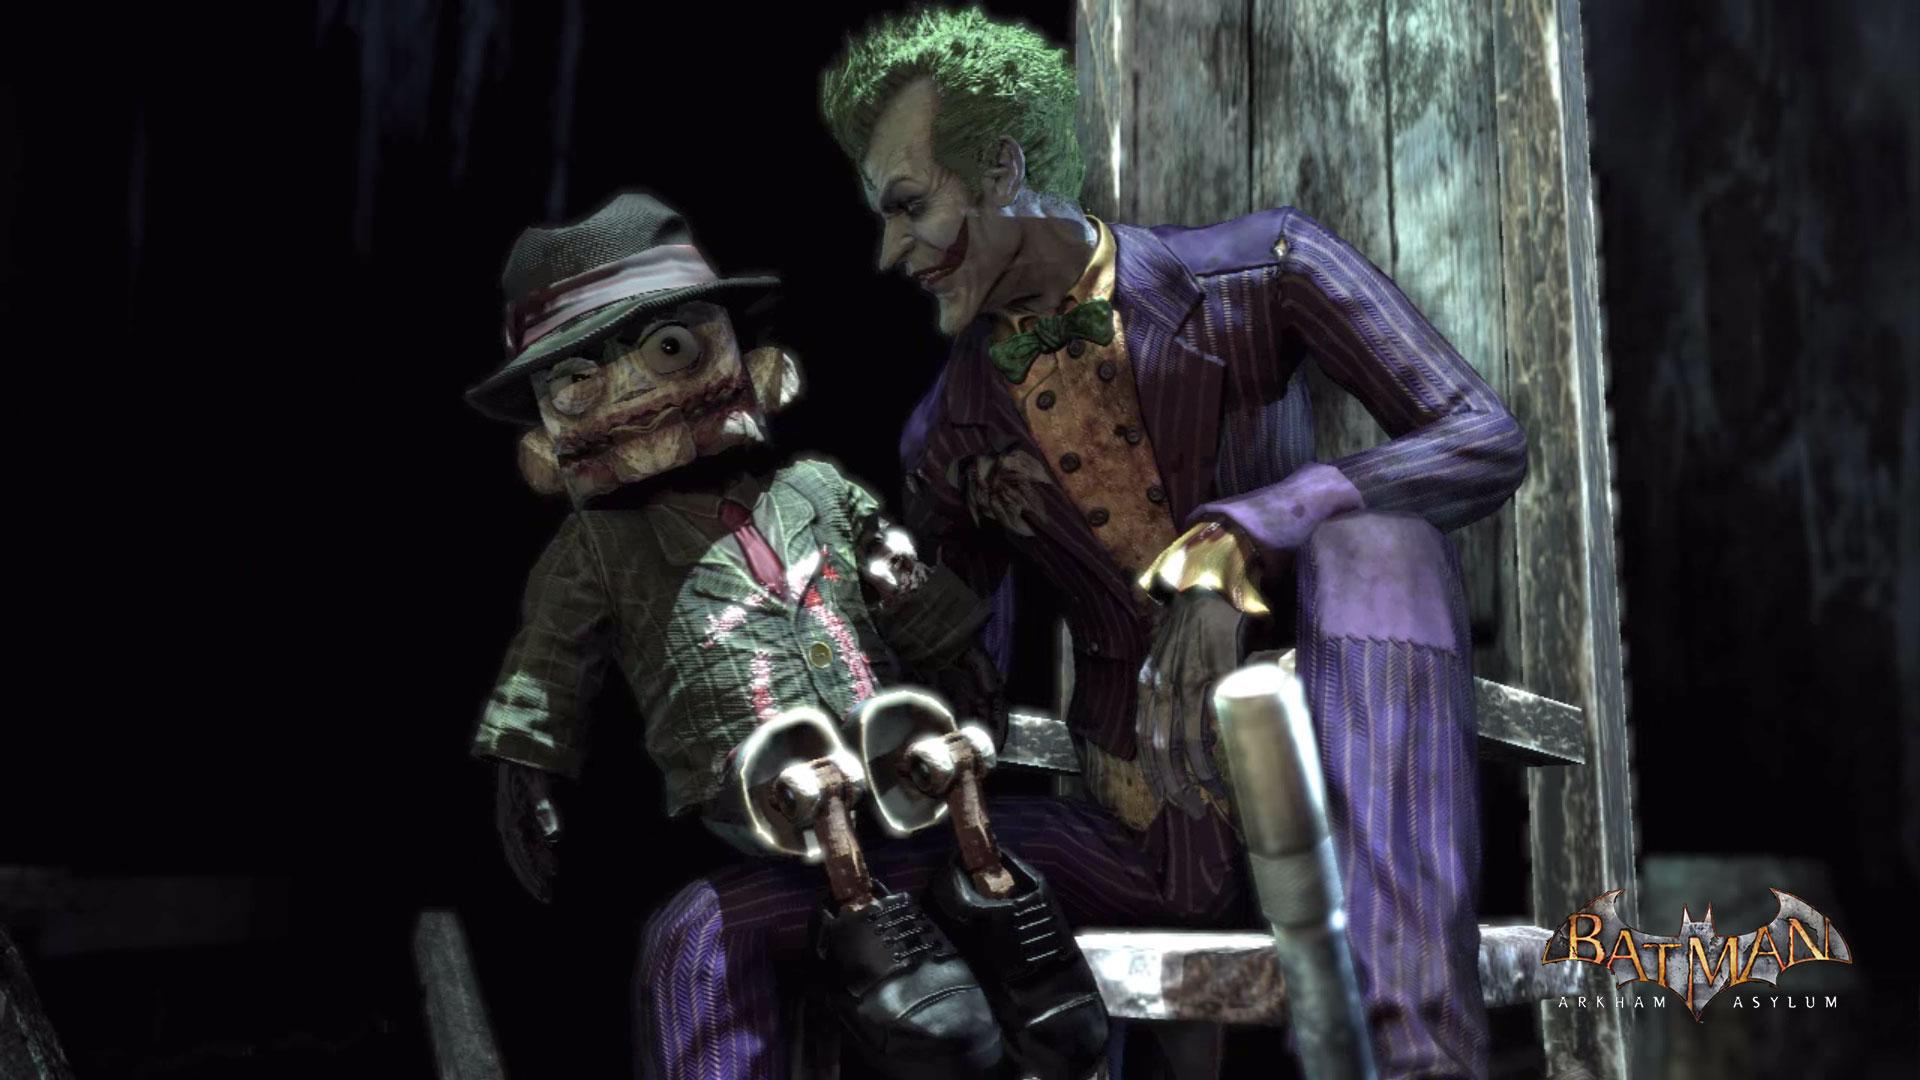 Batman Arkham Asylum   Joker Scarface puppet 1920x1080 wallpaper 1920x1080